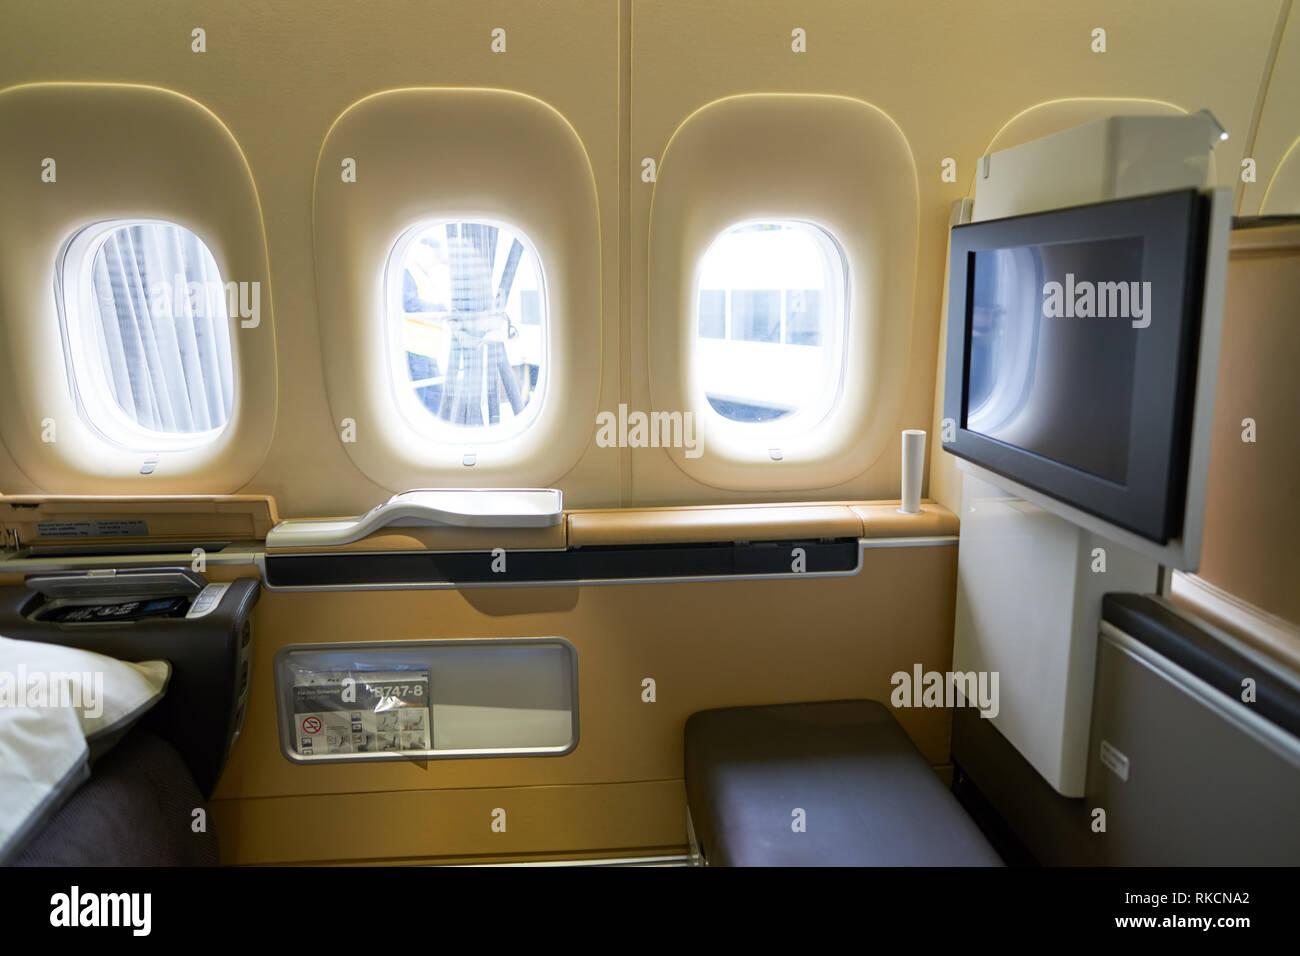 Boeing 747 Interior Stock Photos & Boeing 747 Interior Stock Images